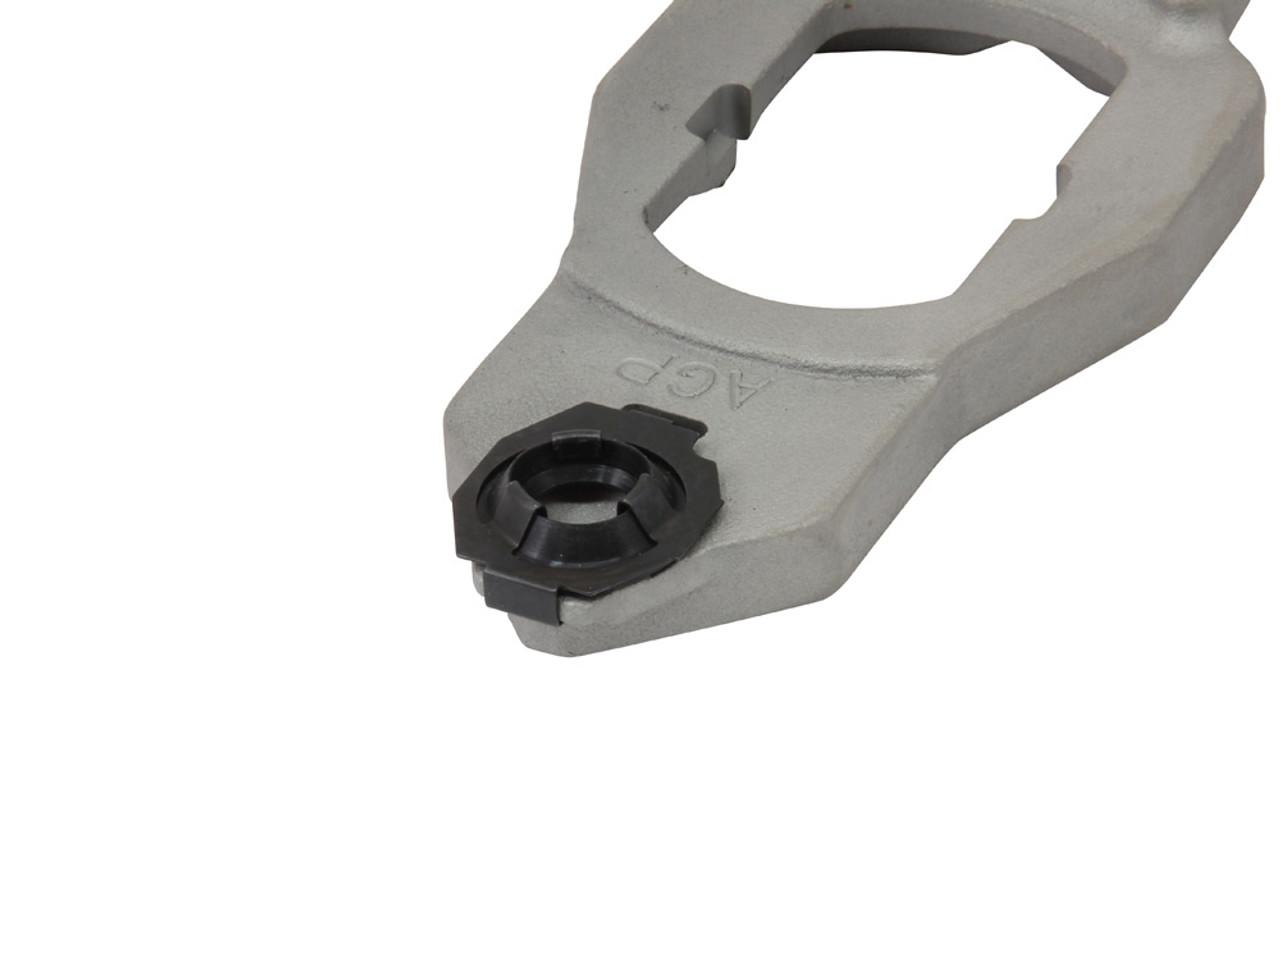 SRT-4 Neon AGP Forged Clutch Fork w/ Billet Pivot Ball